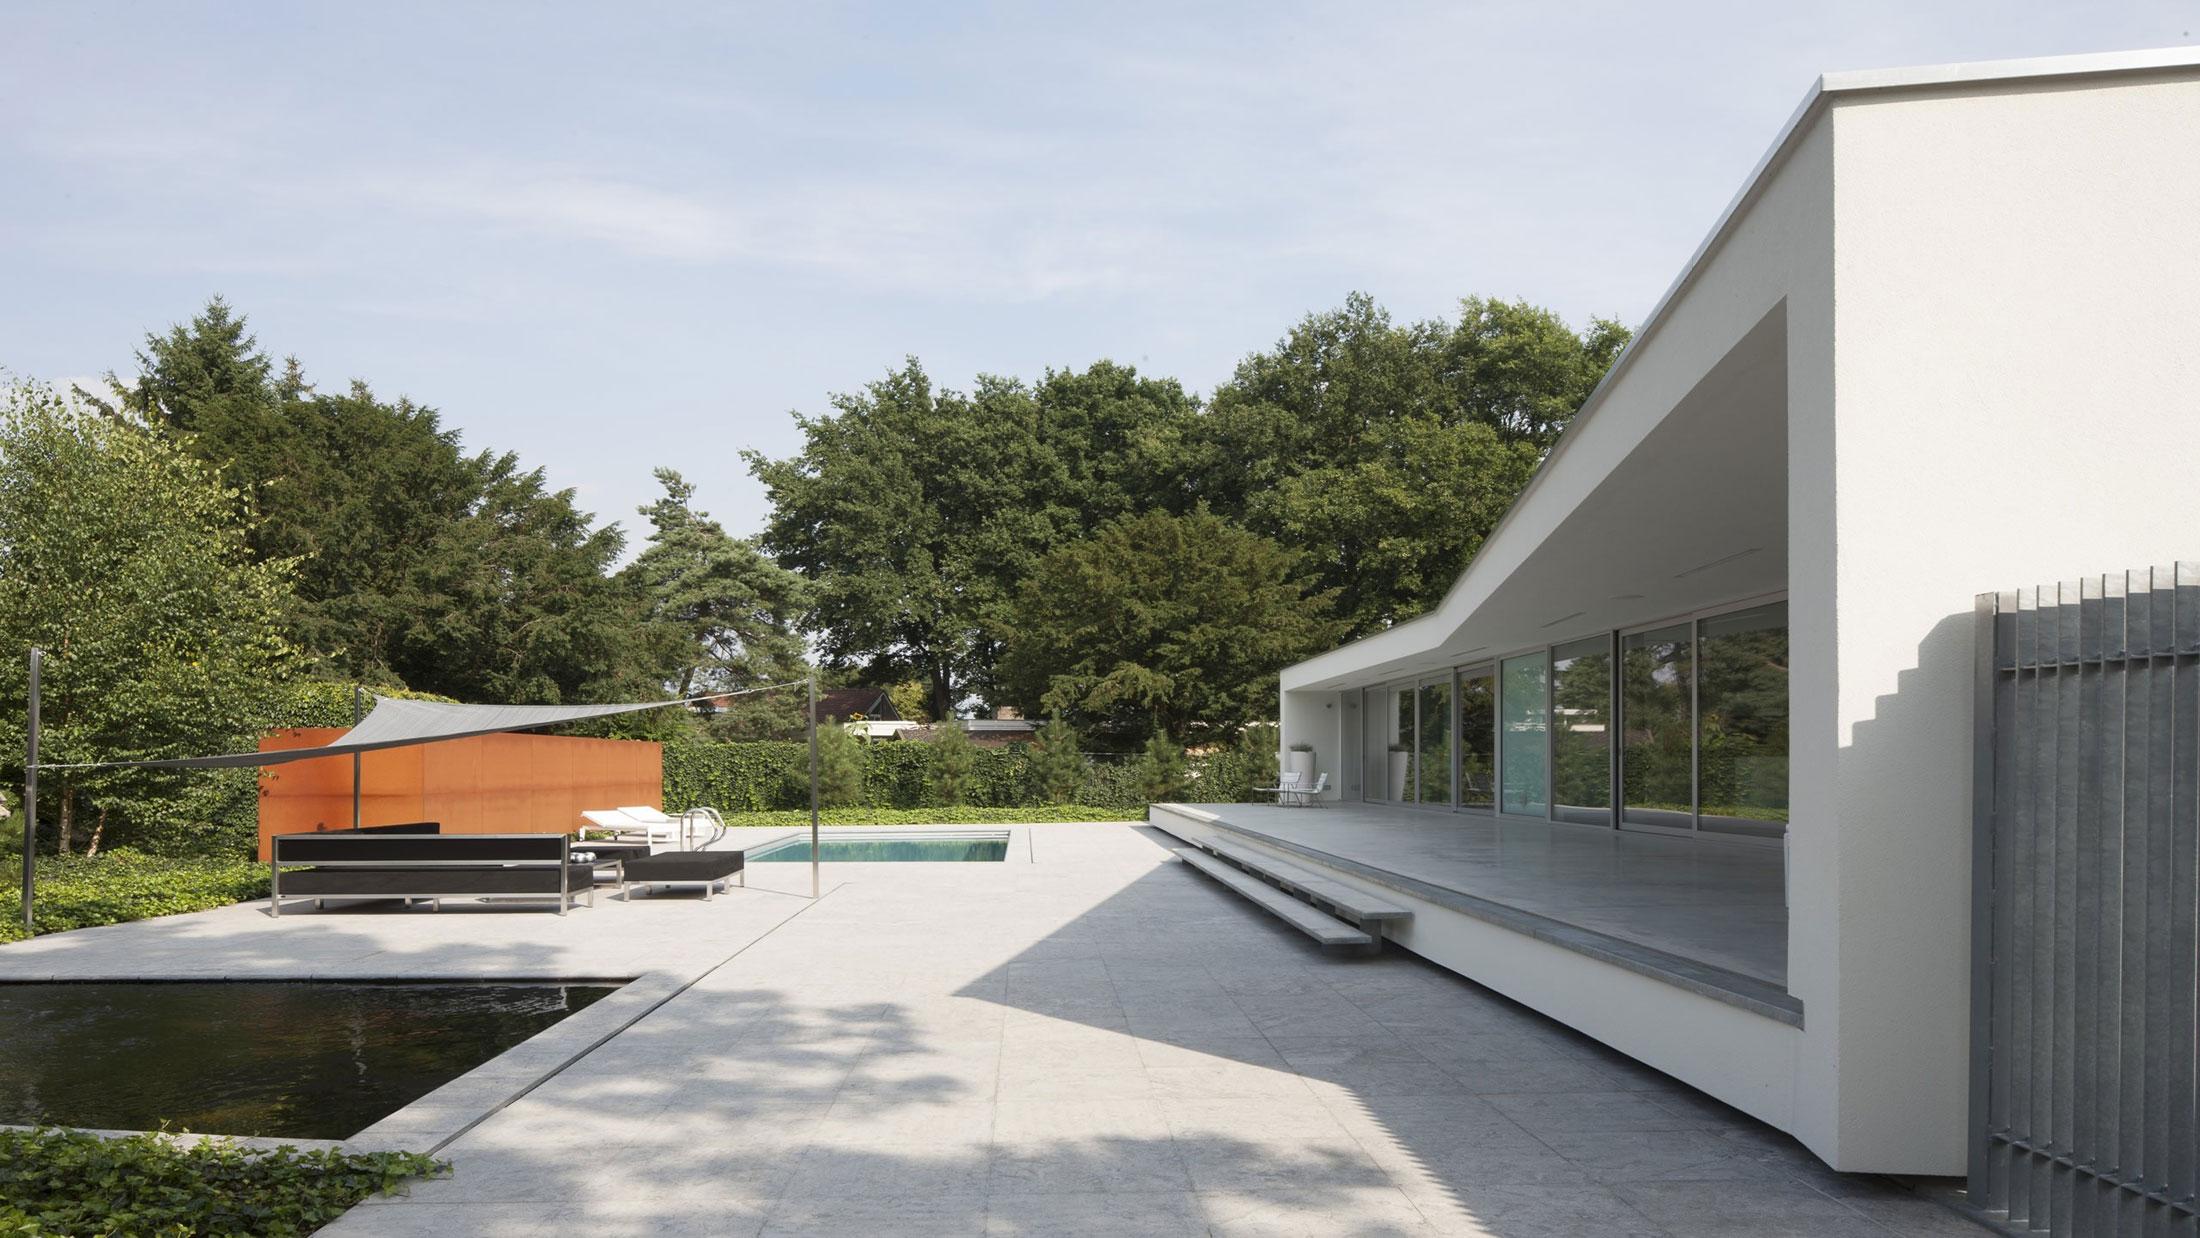 Boxed Villa Spee Haelen with Panoramic Windows by Lab32 architecten-11